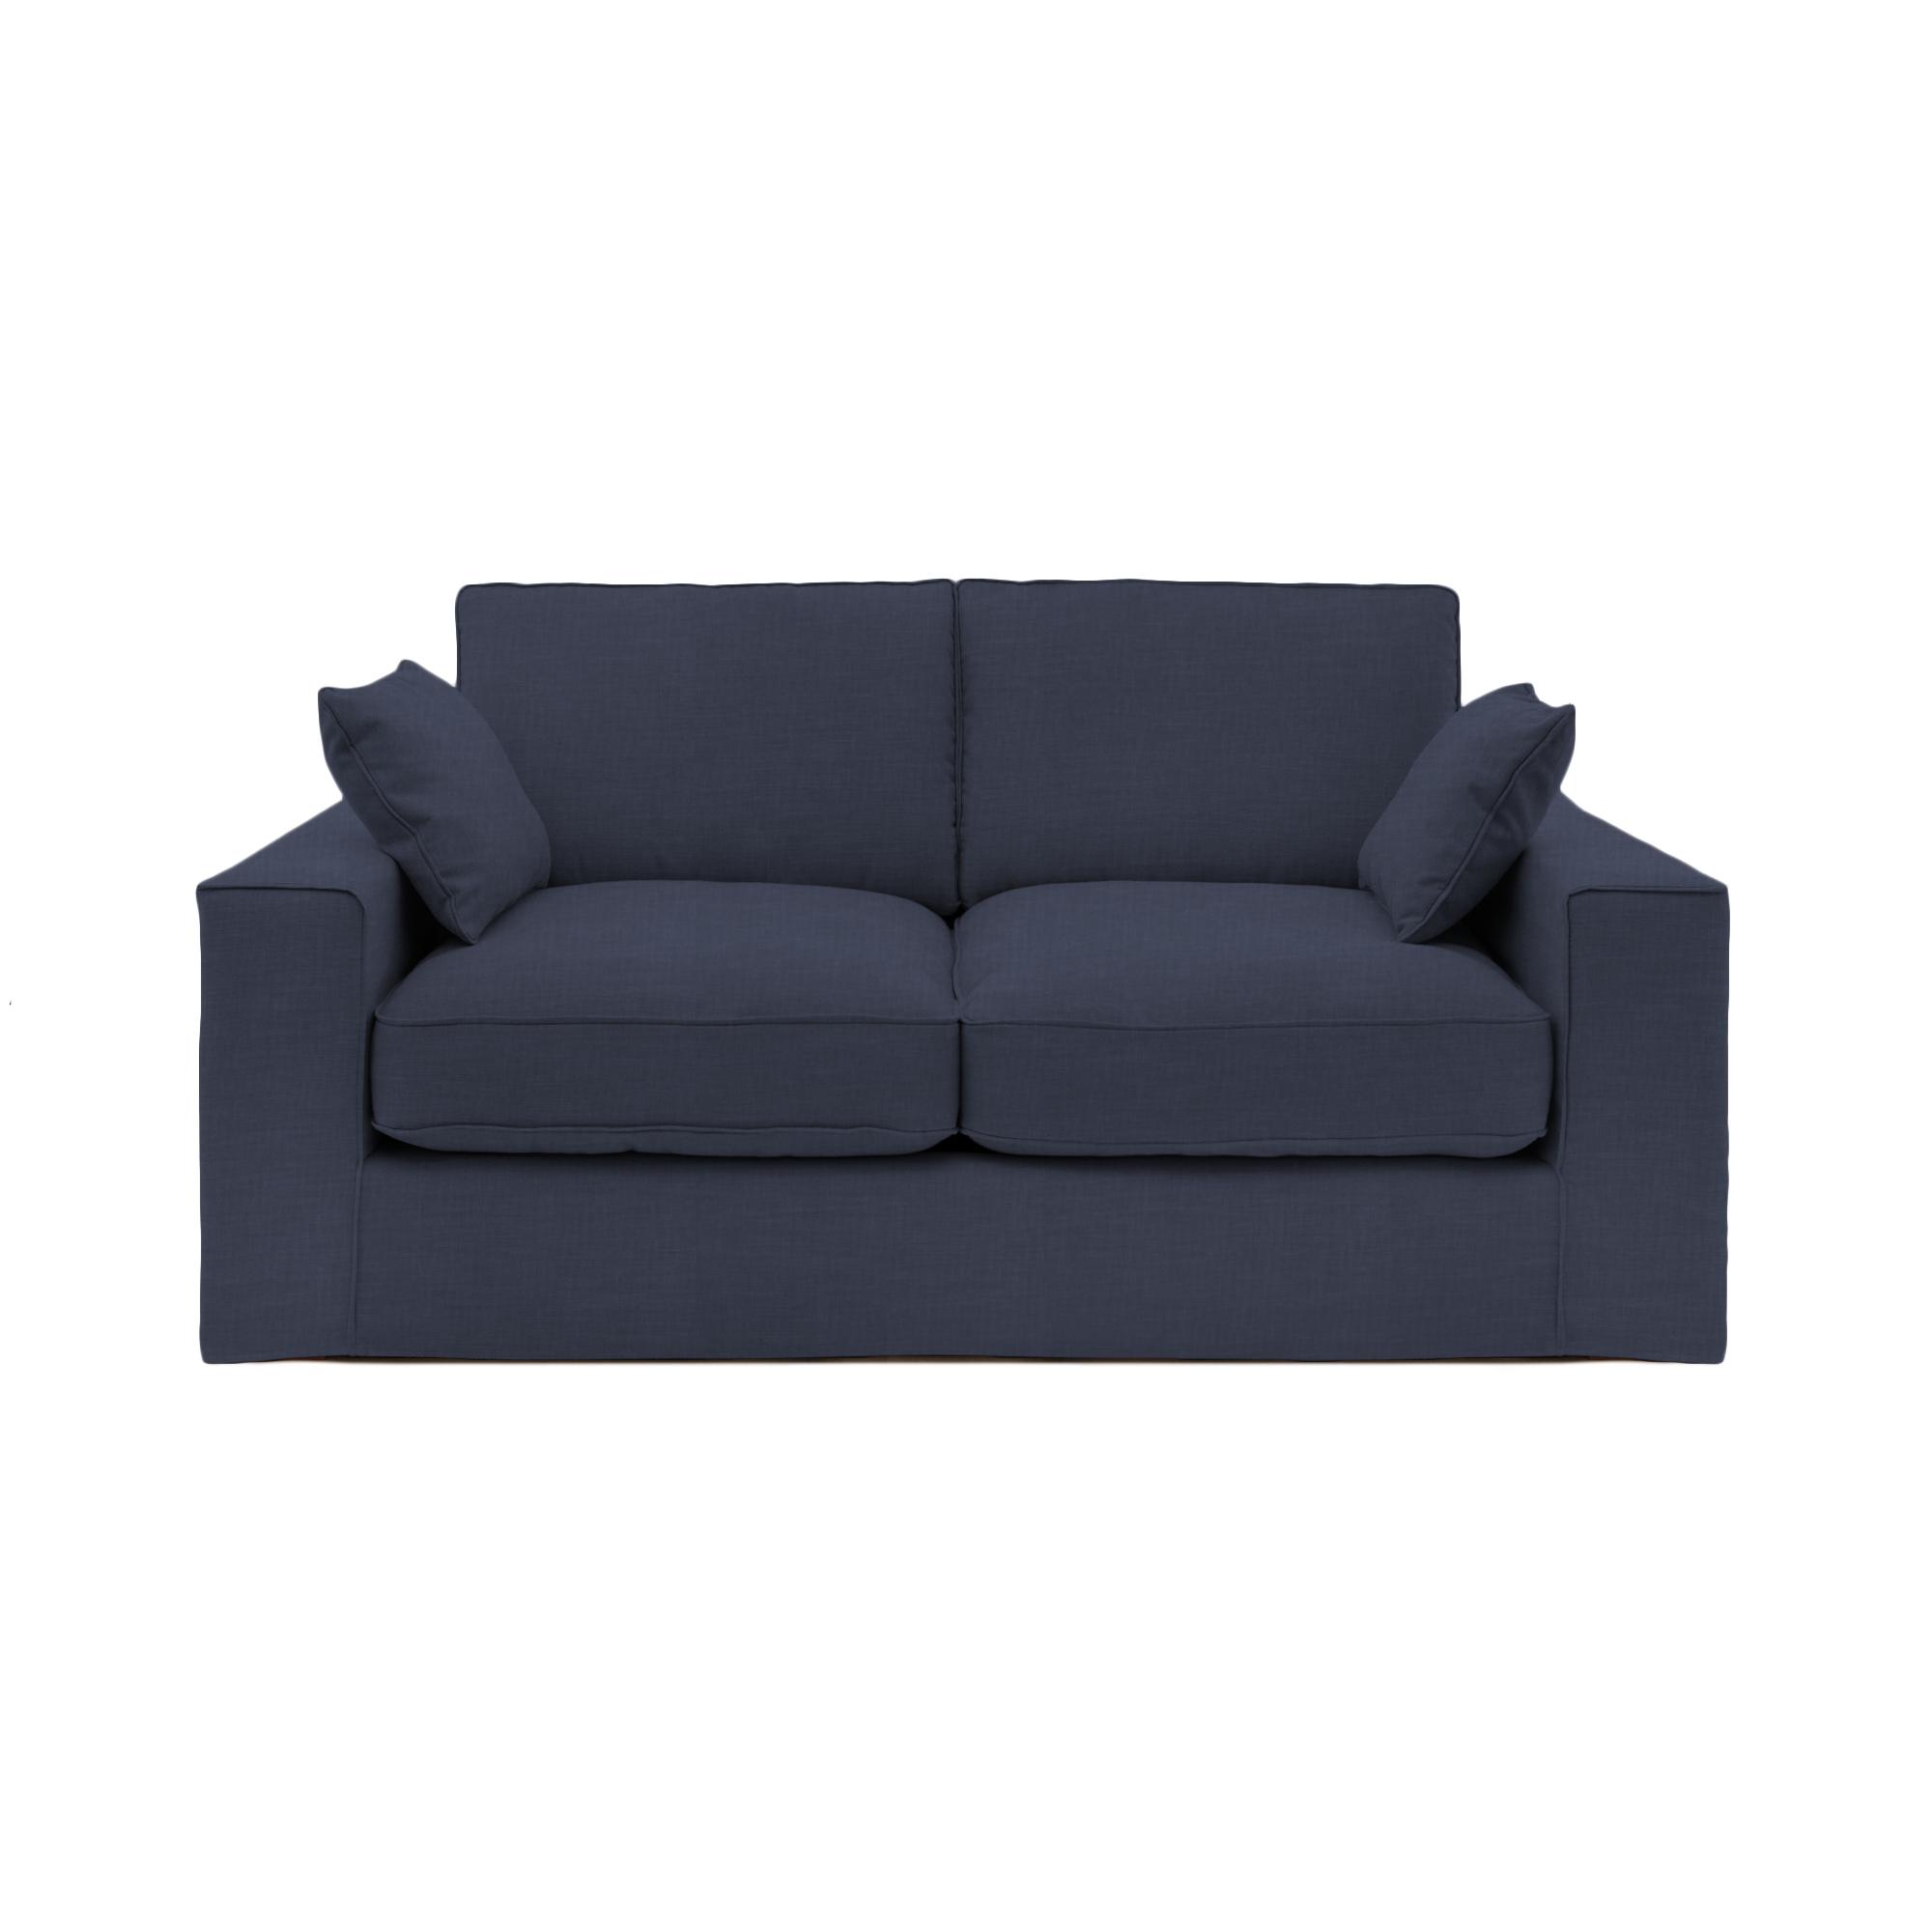 Canapea Fixa 3 locuri Jane Marine Bleu